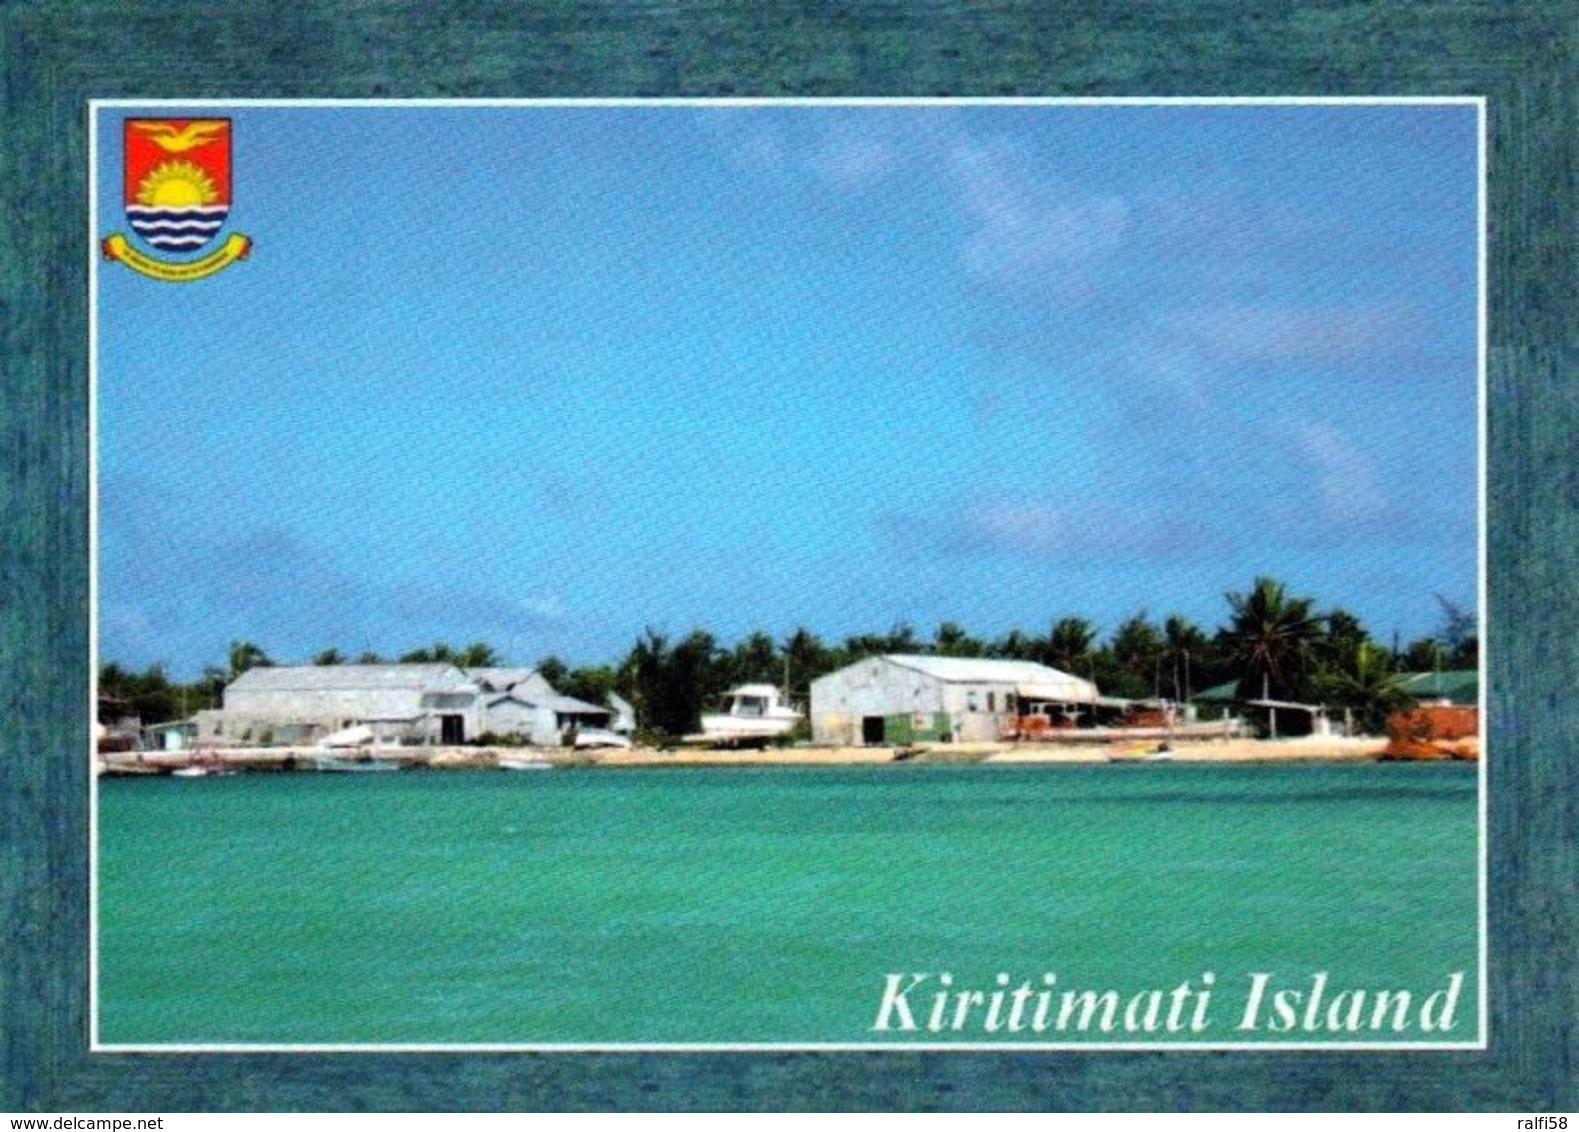 1 AK Kiribati * Kiritimati - Früher Christmas Island, Von Allen Koralleninseln Der Erde Hat Kiritimati D. Gr. Landfläche - Kiribati